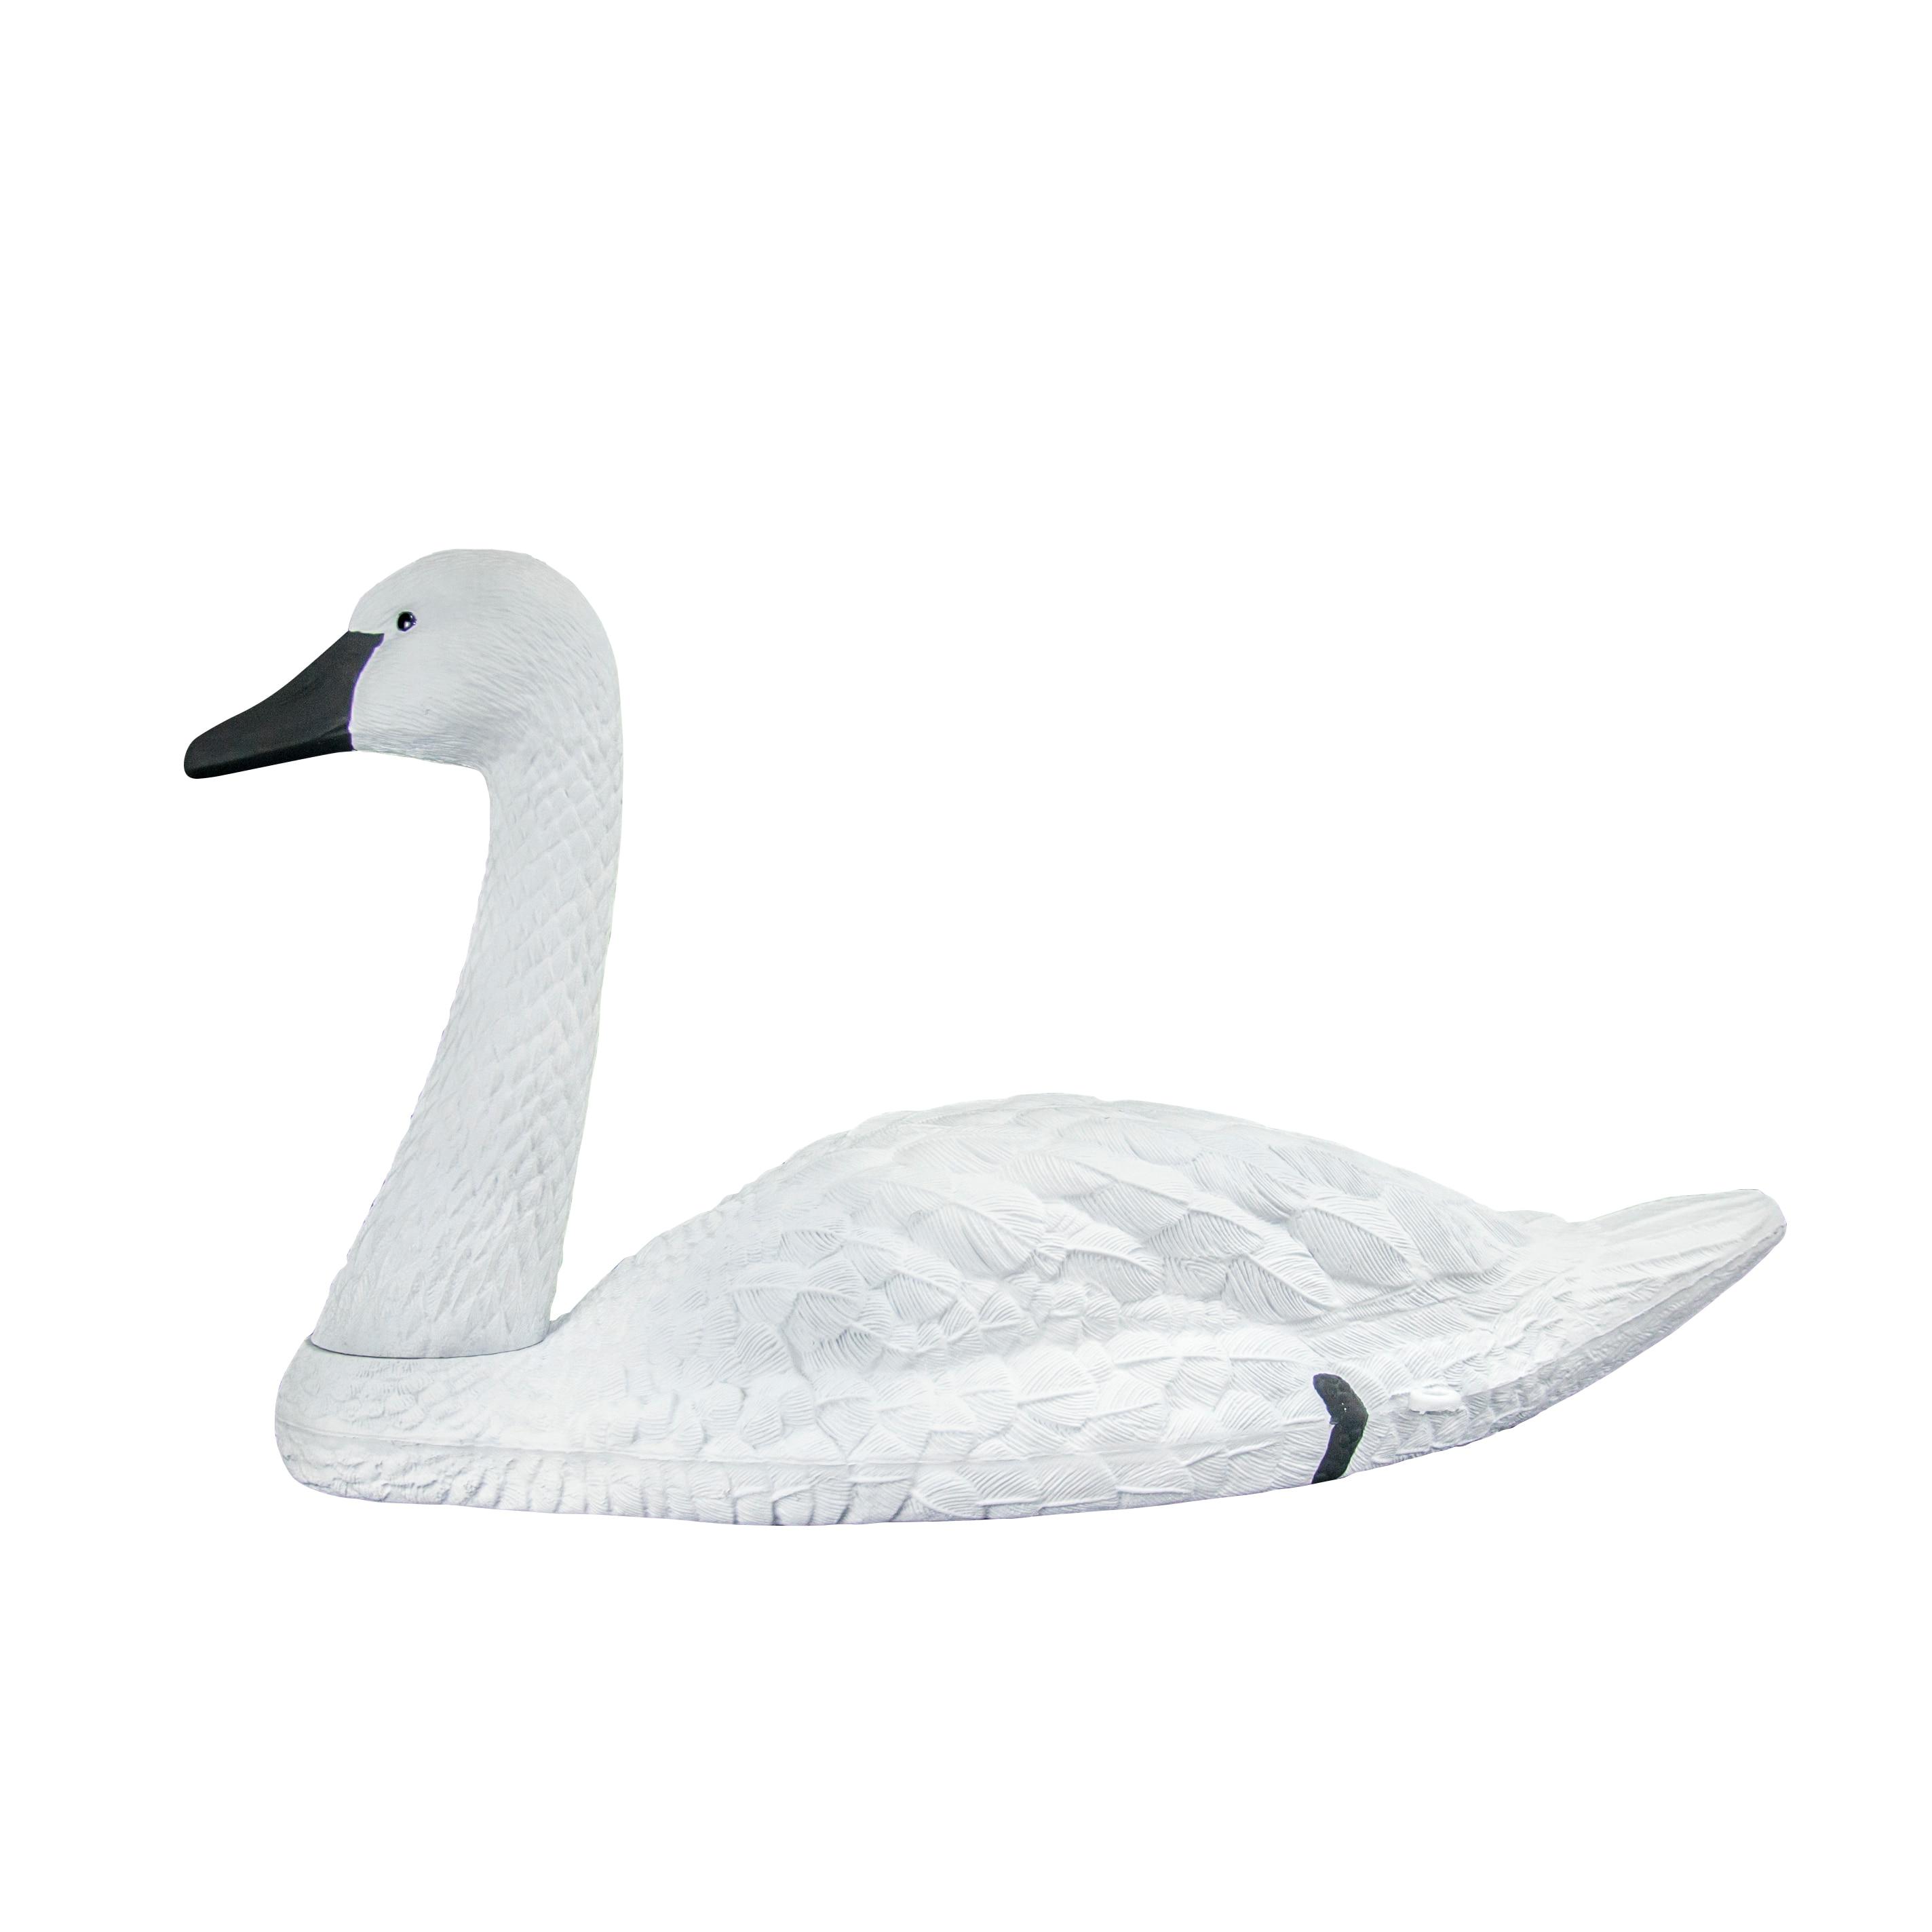 Leurre canard chasse leurres oie leurre grand cygne blanc jardin piscine décoration flottant blanc muet cygne leurre oies